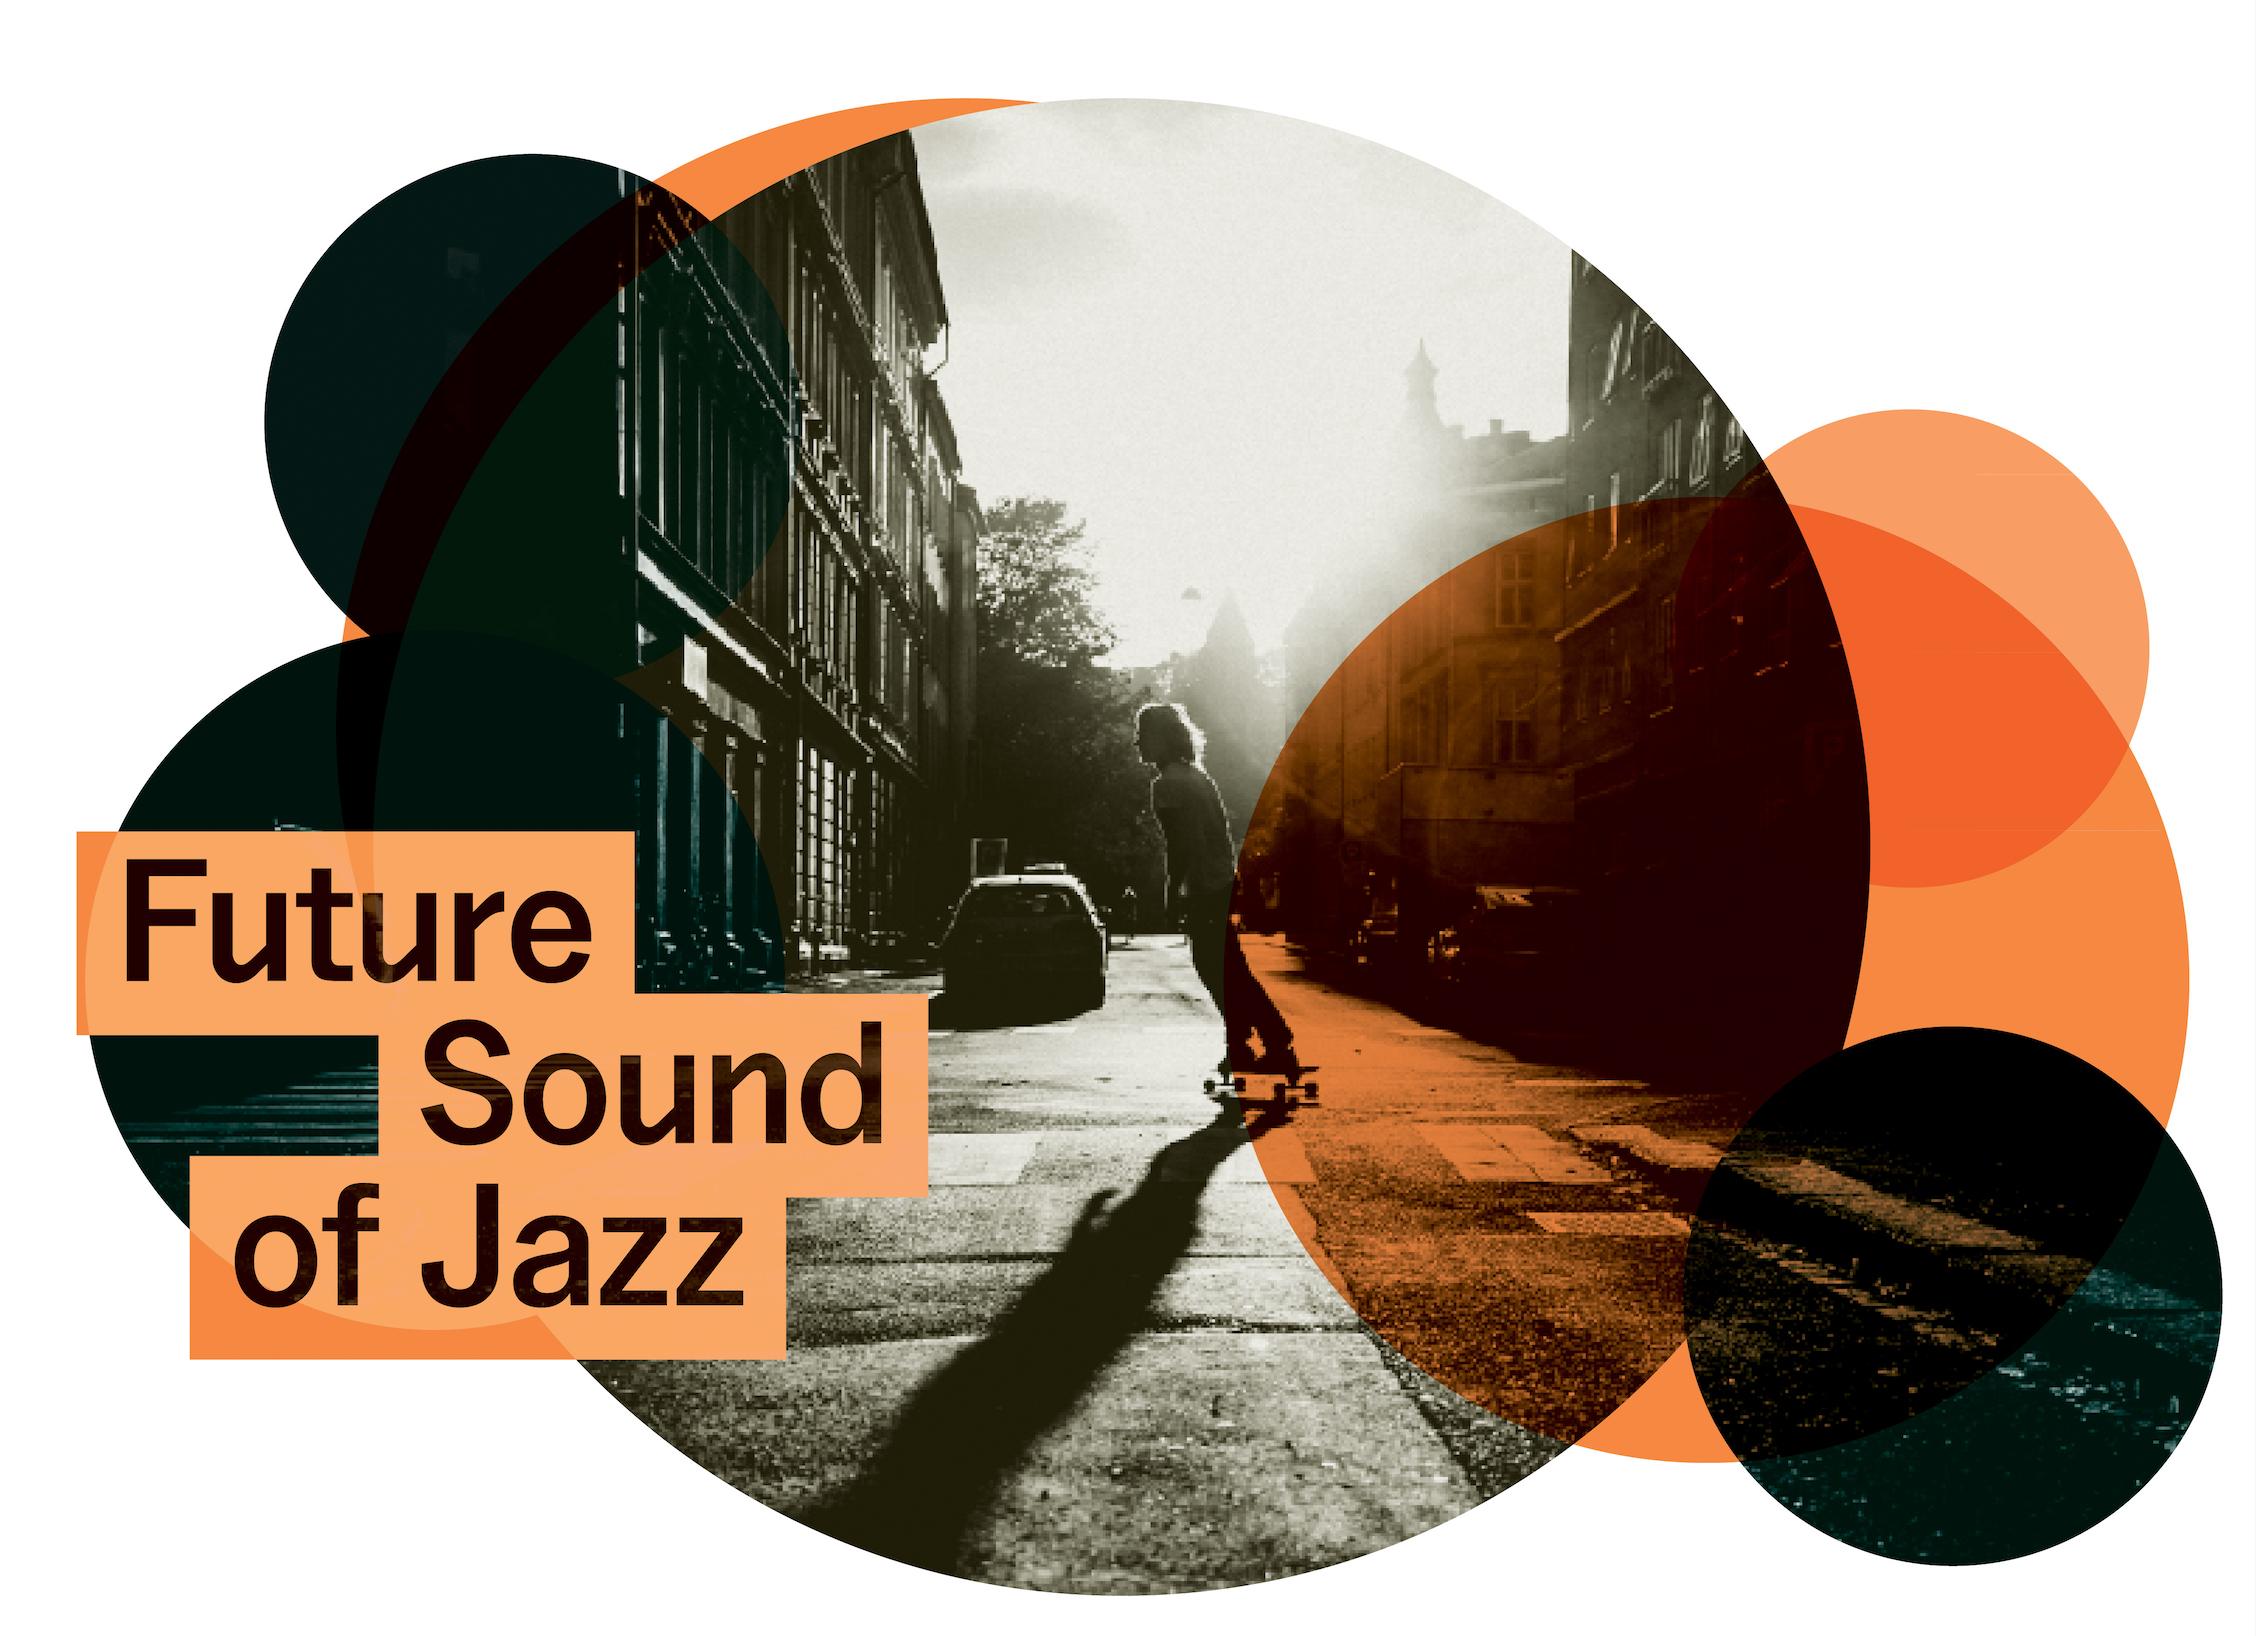 Future Sound of Jazz